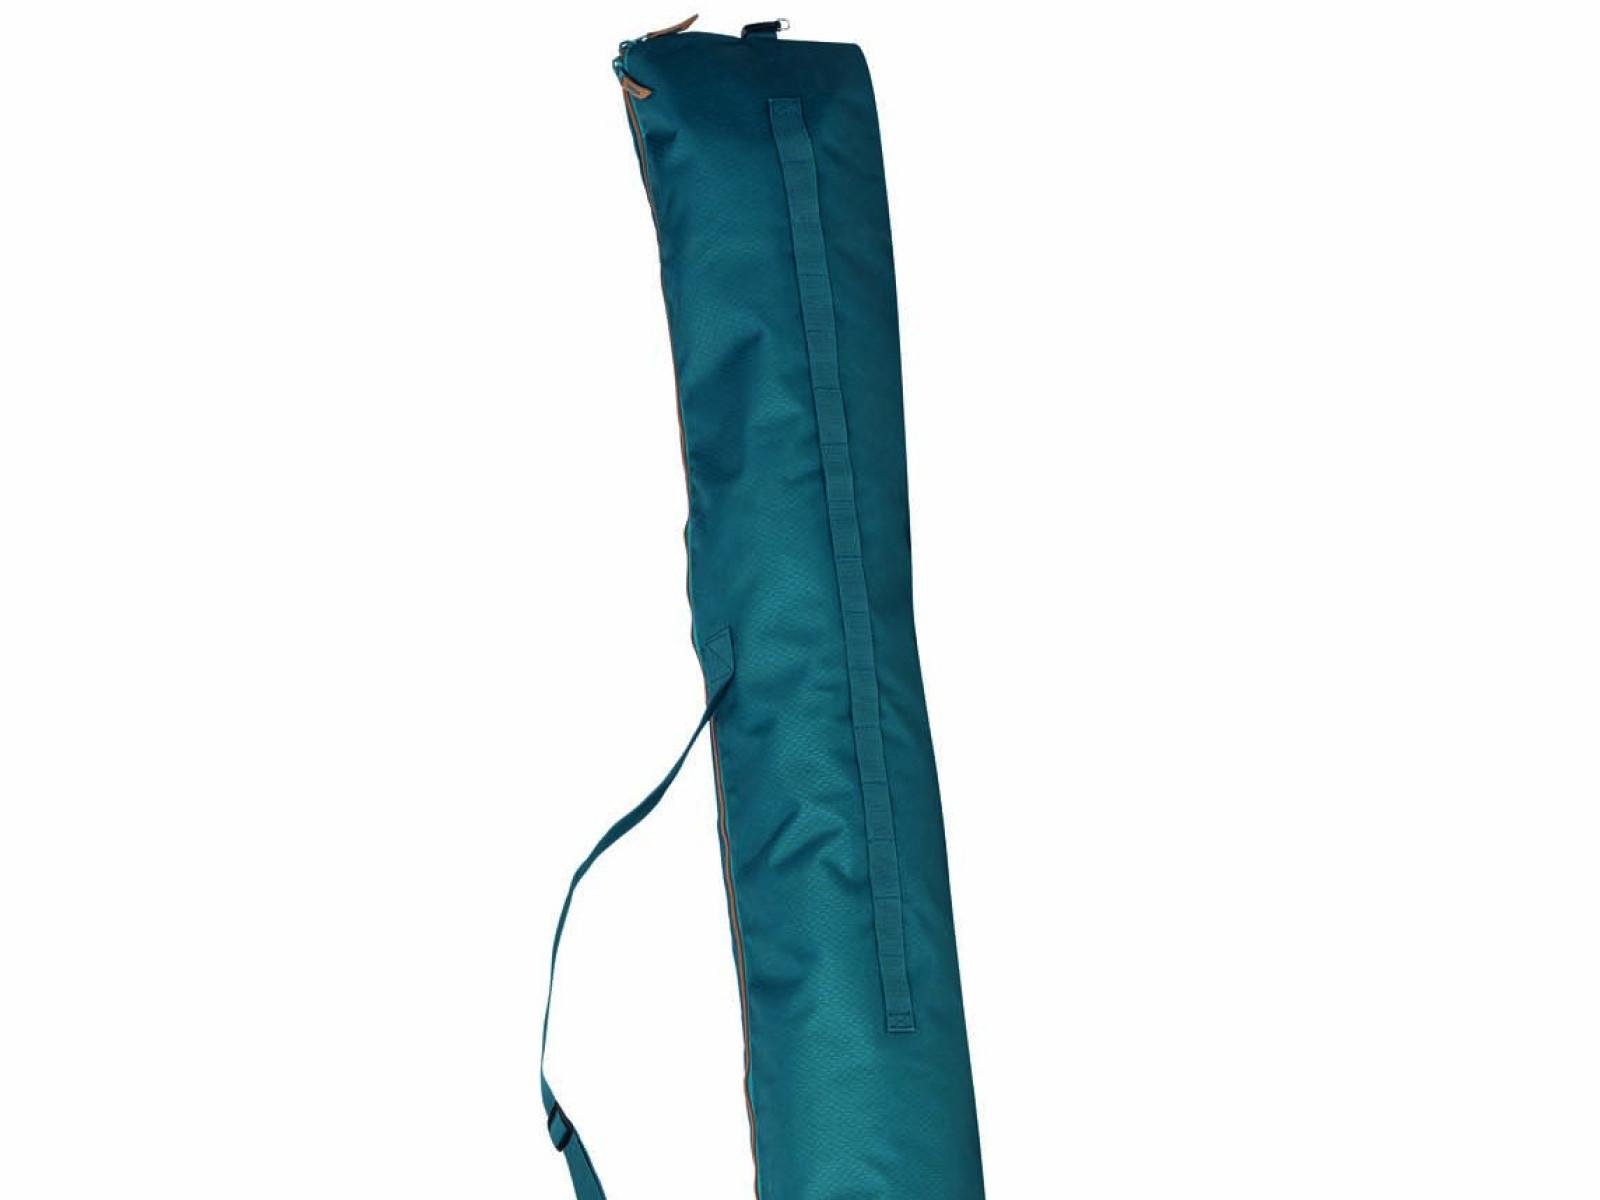 Rossignol Electra Extendable Bag 140-180 cm 2020/2021.